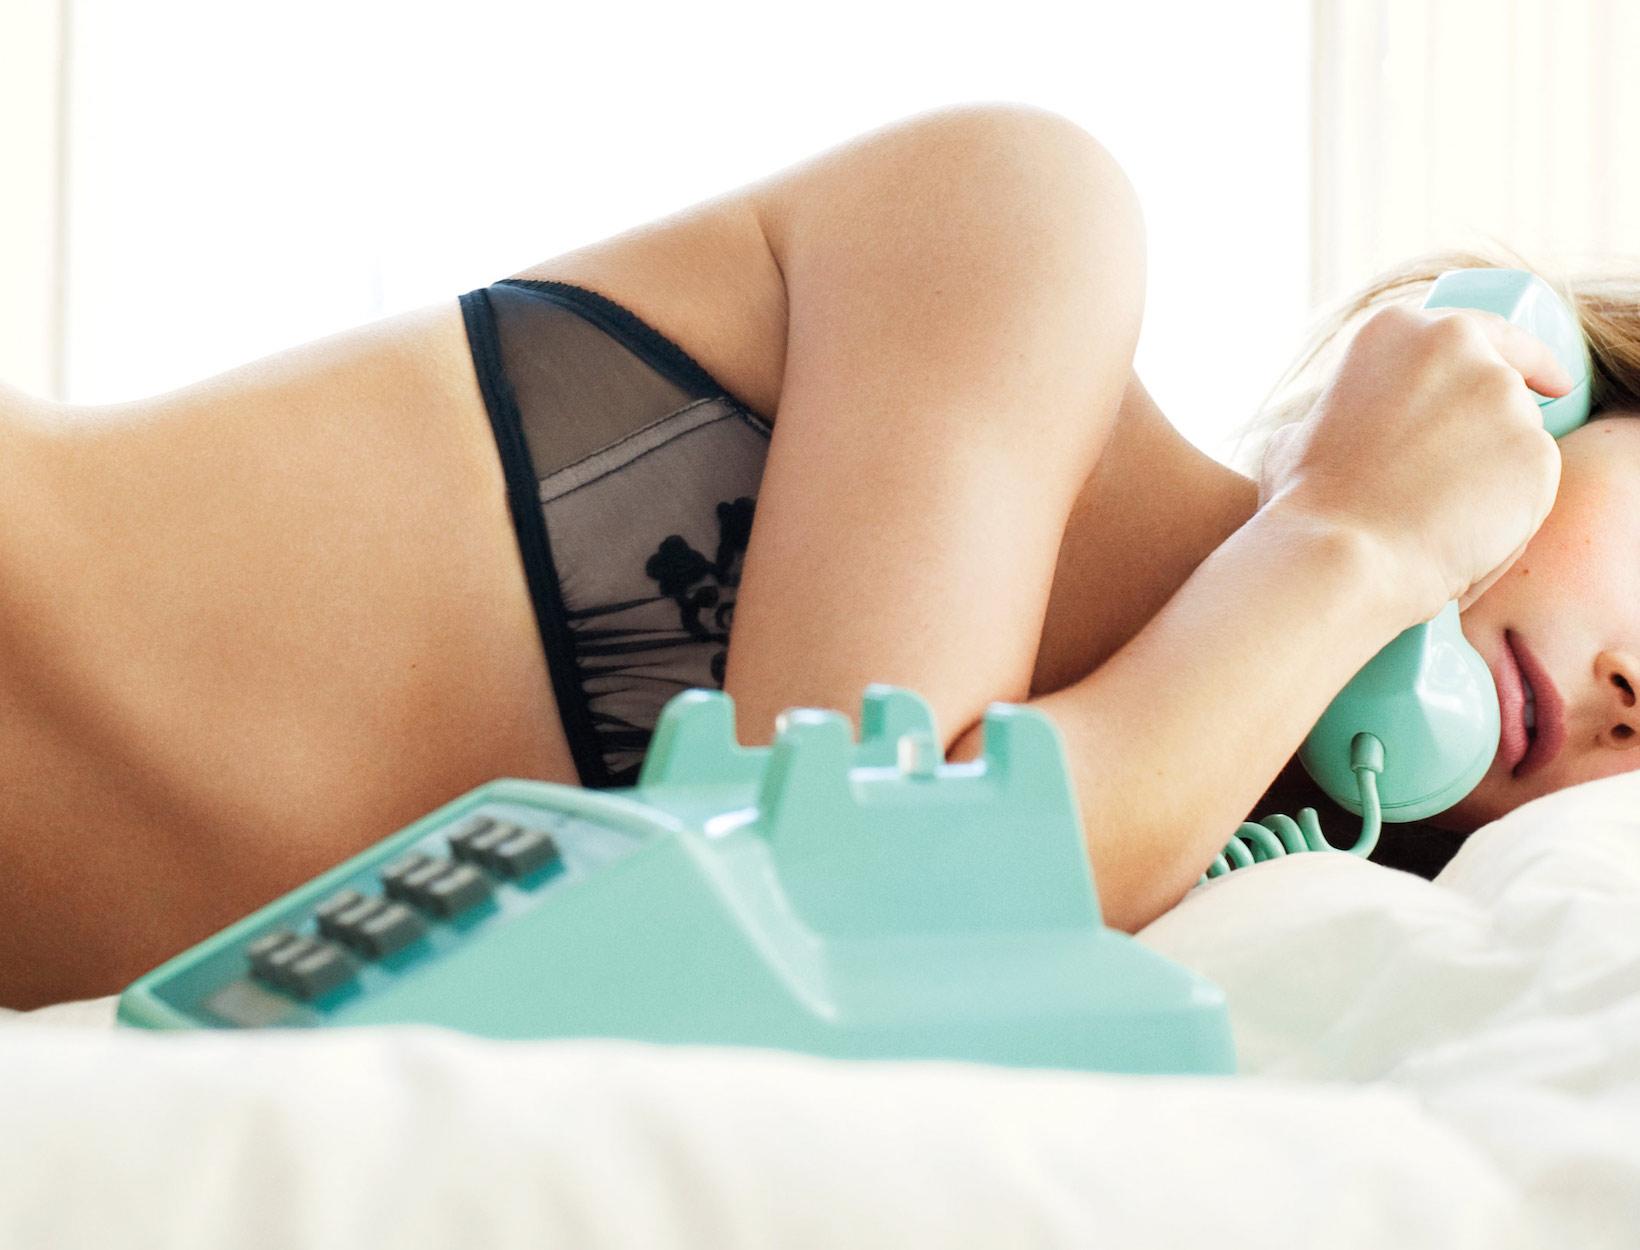 Phone Sex Picture